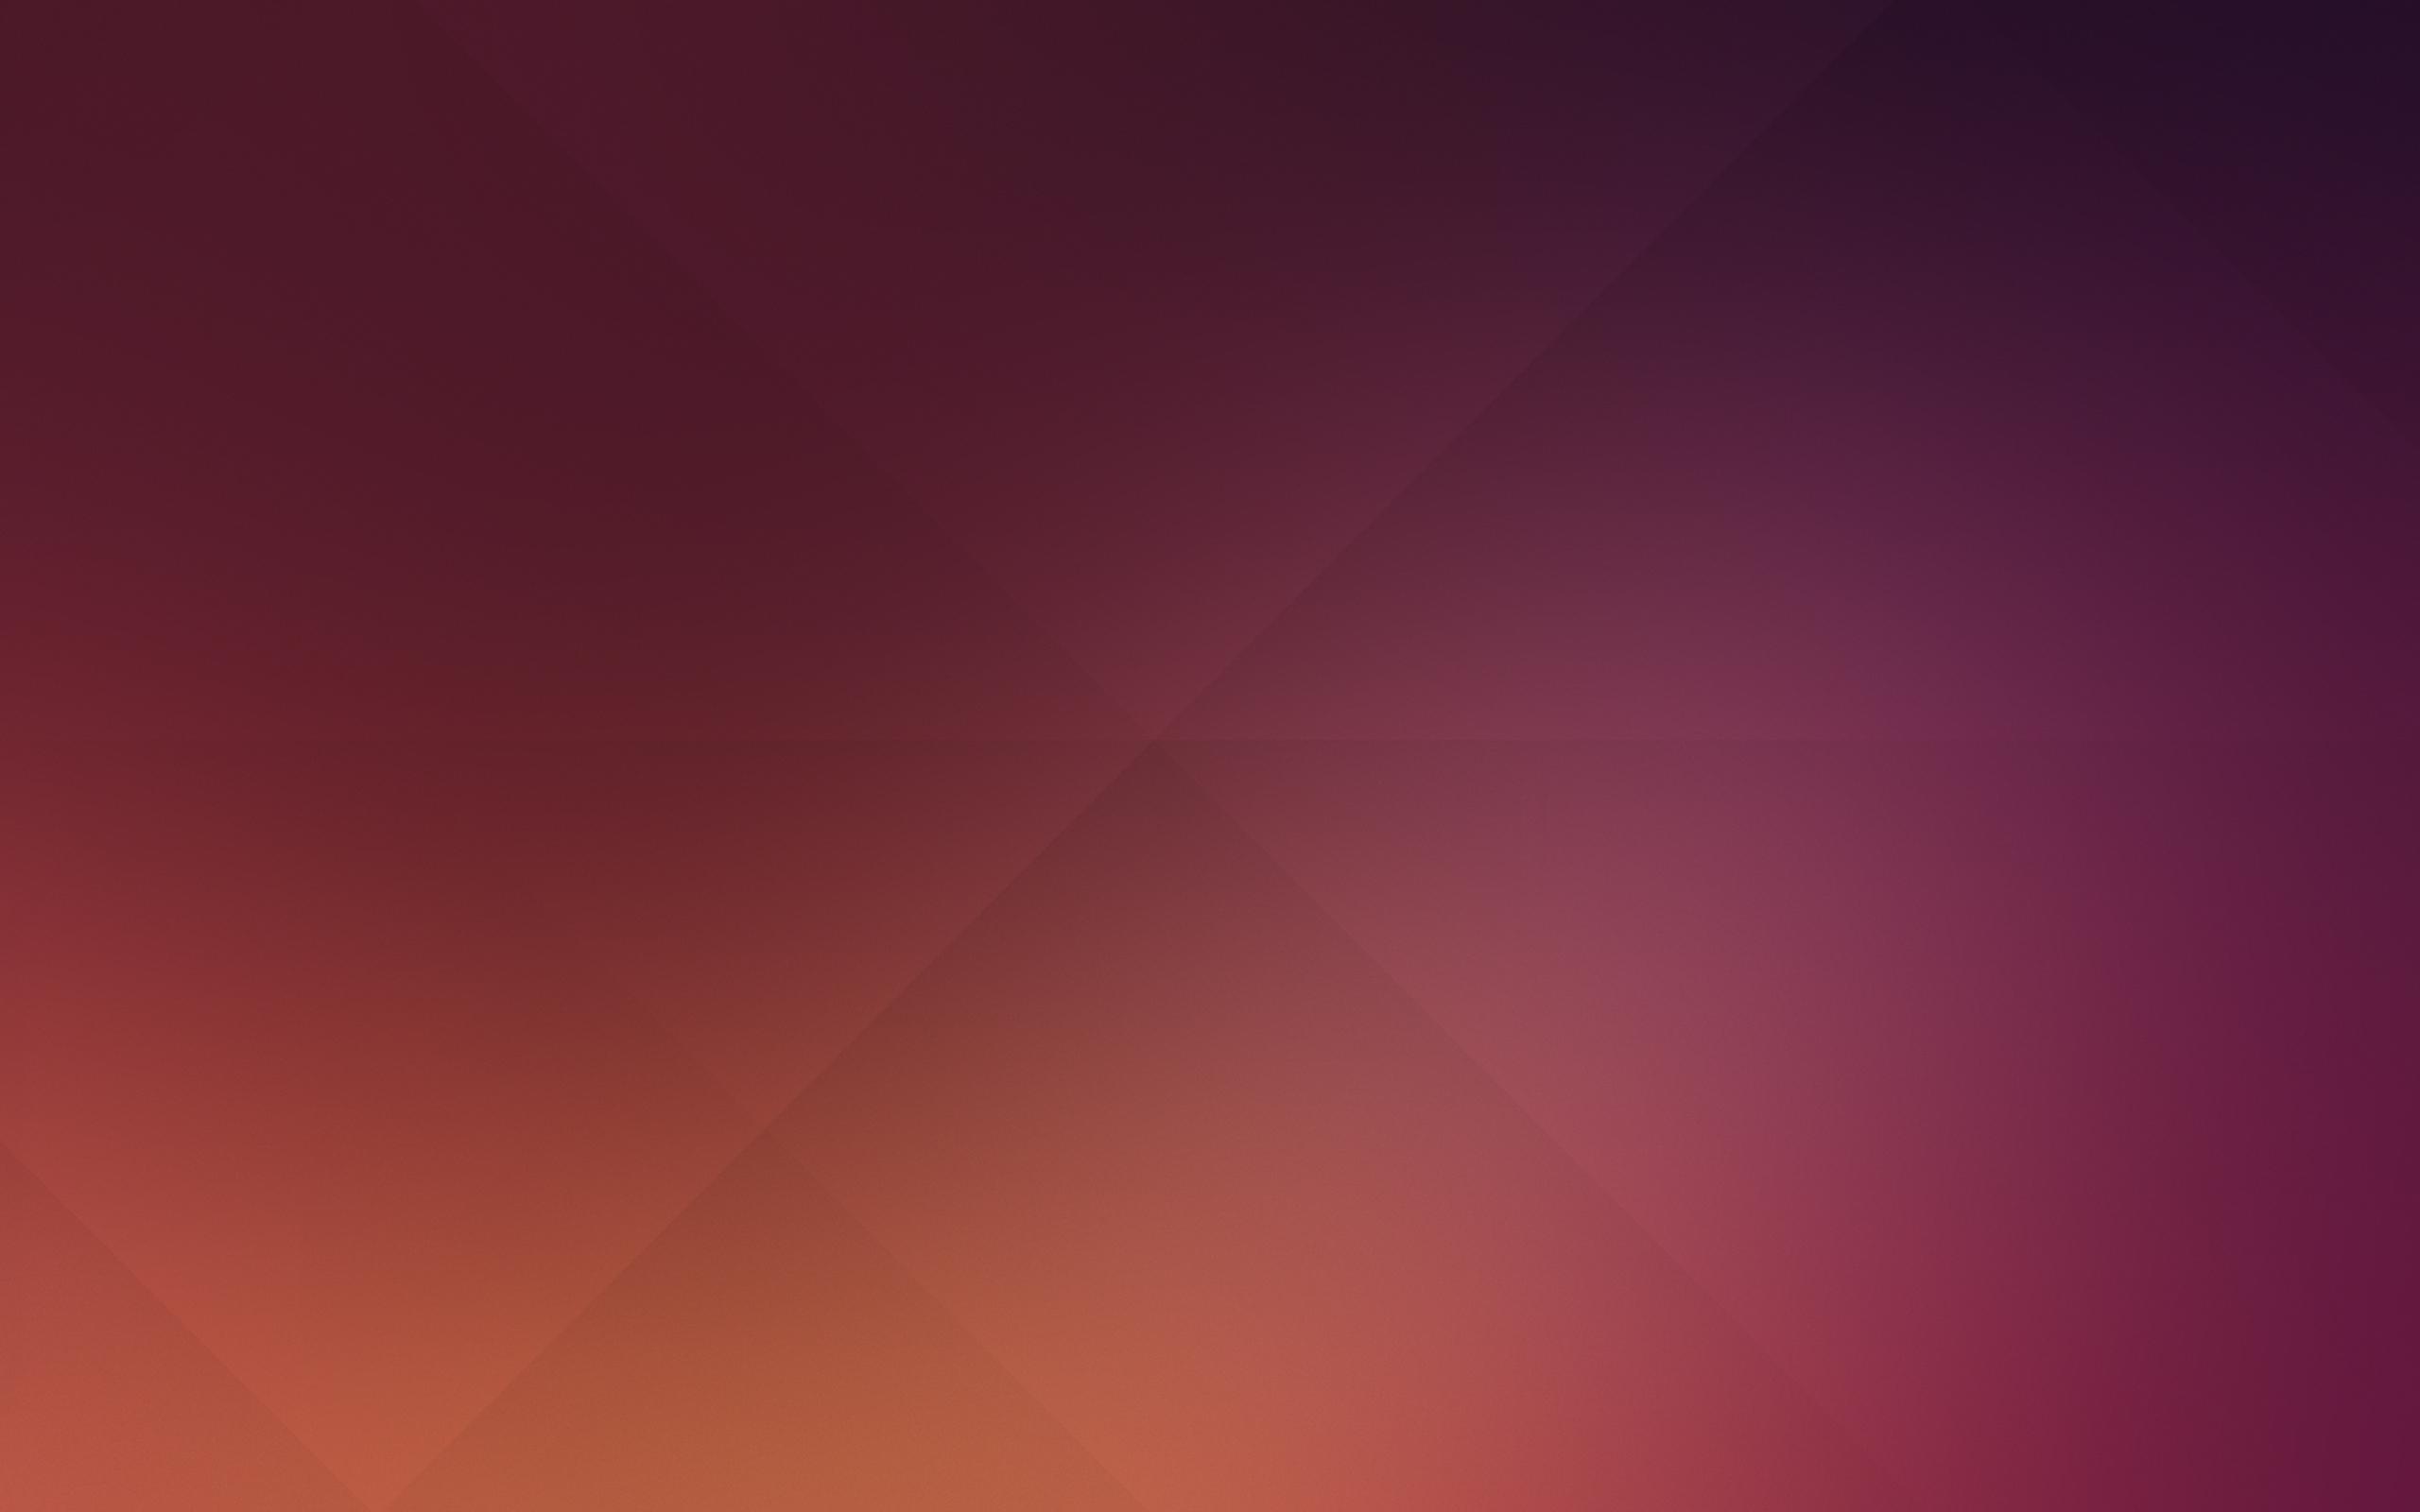 Ubuntu-14-04-Default-Wallpaper